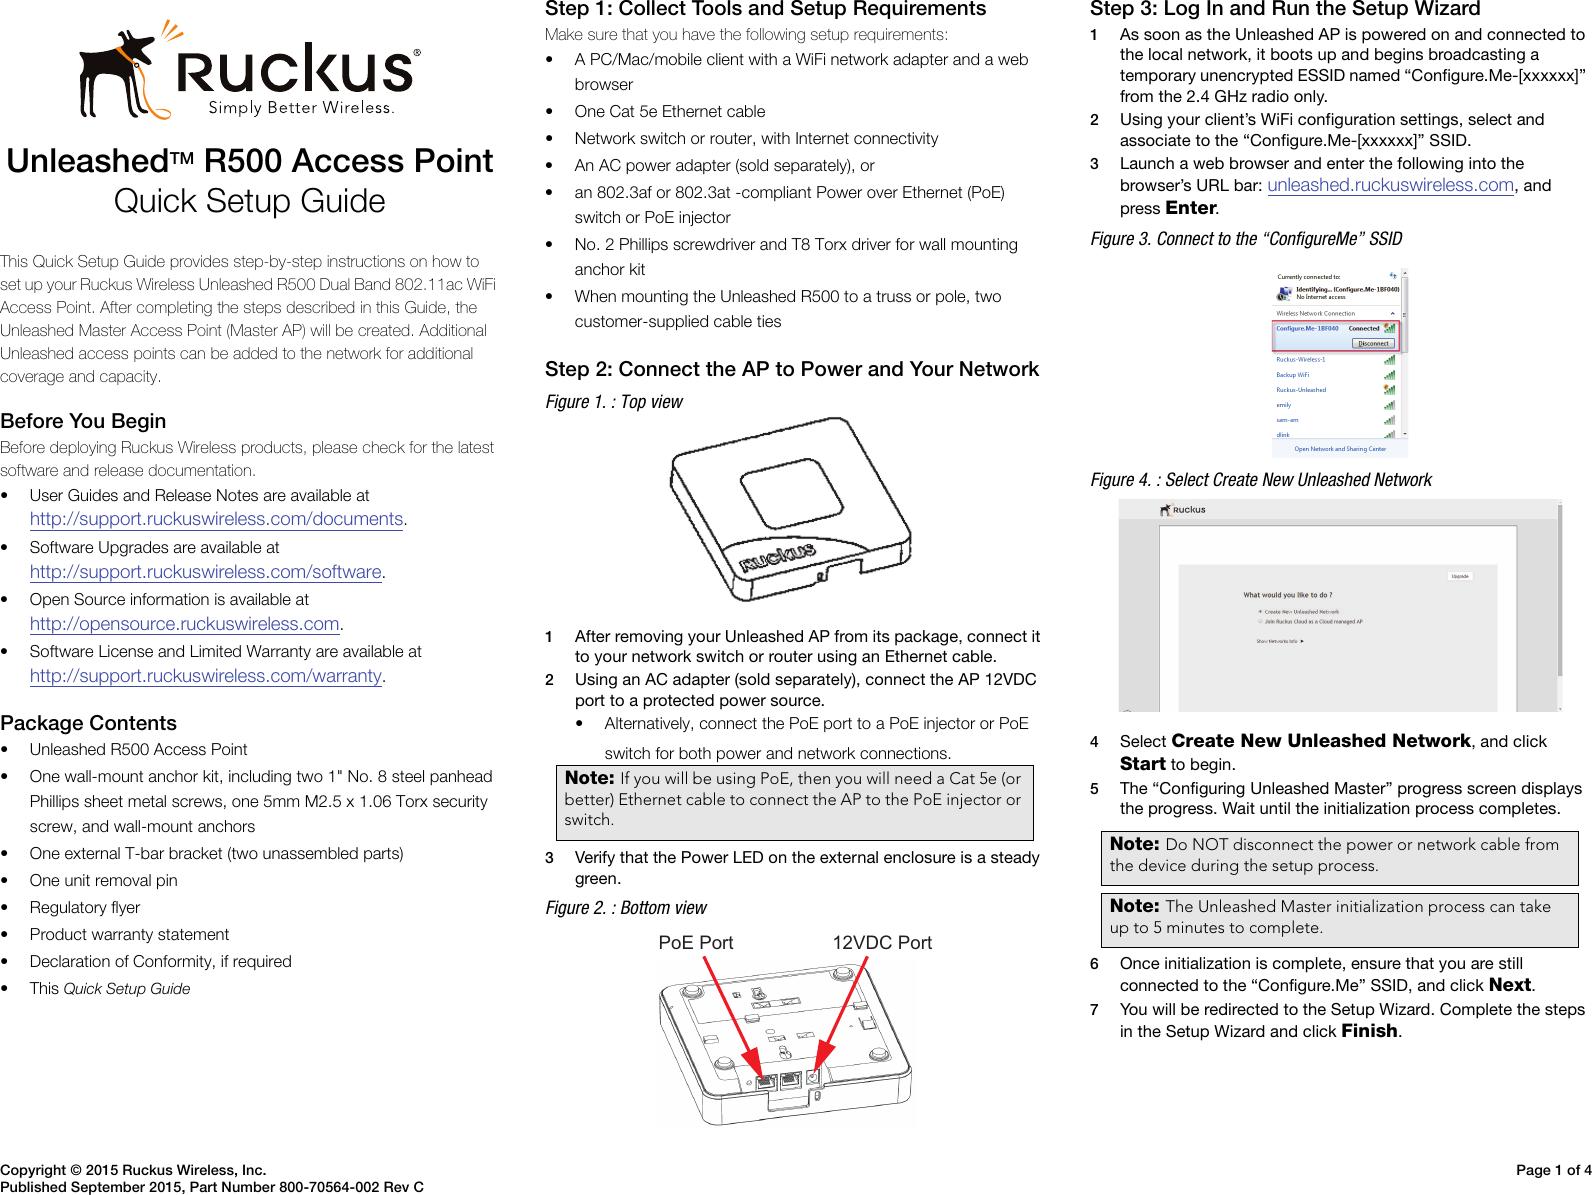 Ruckus ZoneFlex P300 Wireless Bridge Quick Setup Guide